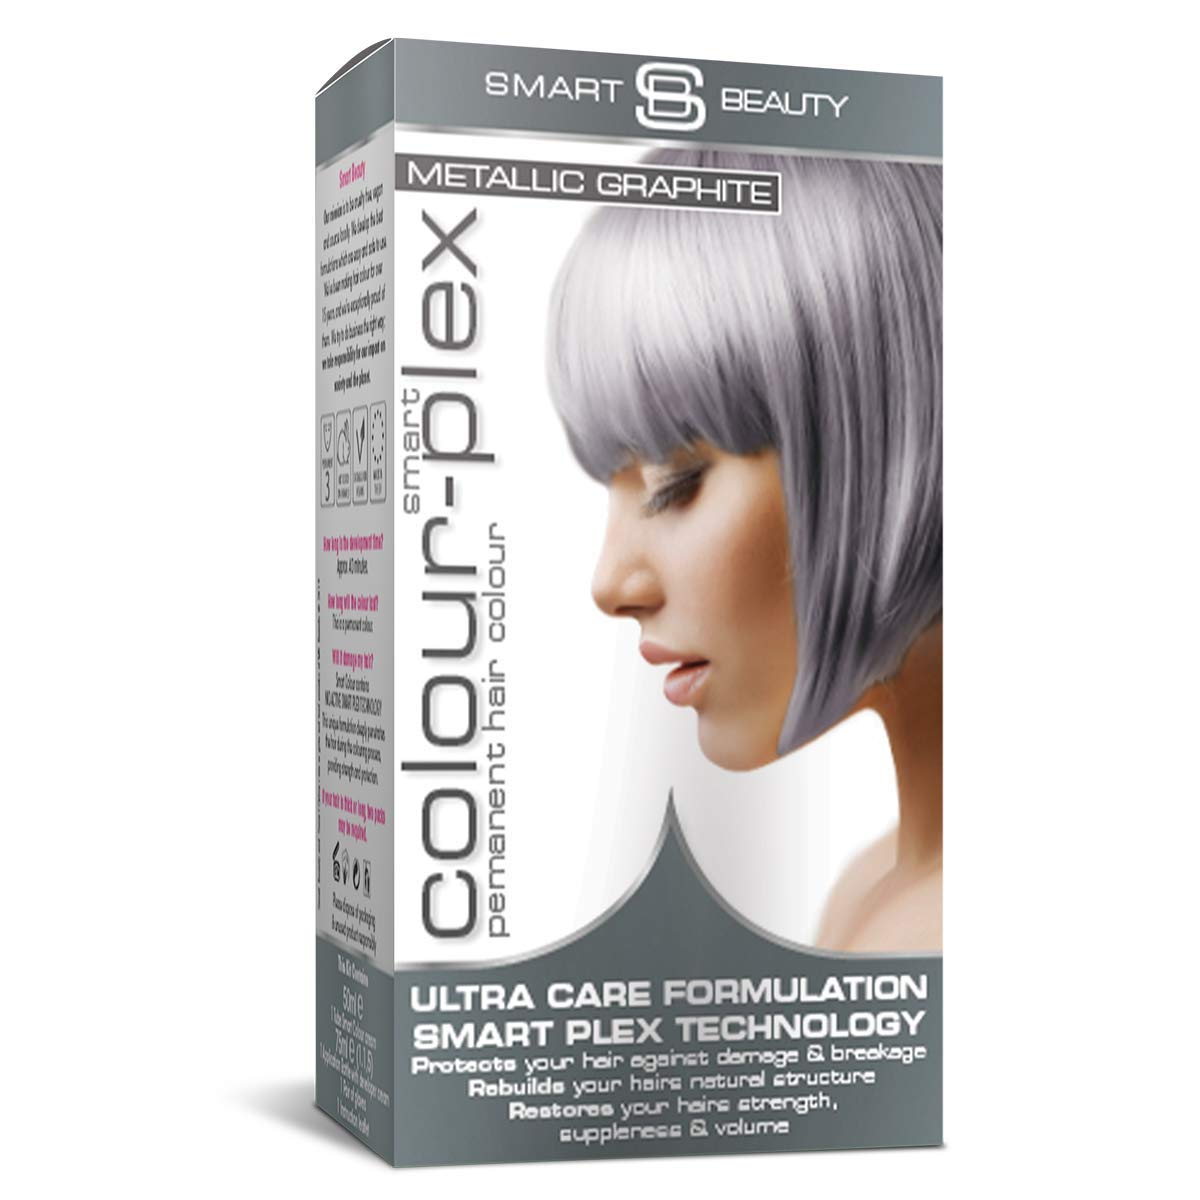 Metallic Graphite Grey Hair Dye | Permanent graphite Grey hair colour | Grey home hair colouring kit | Vegan hair dye | Cruelty free | Smart Beauty hair colours + Smart Plex anti-breakage technology